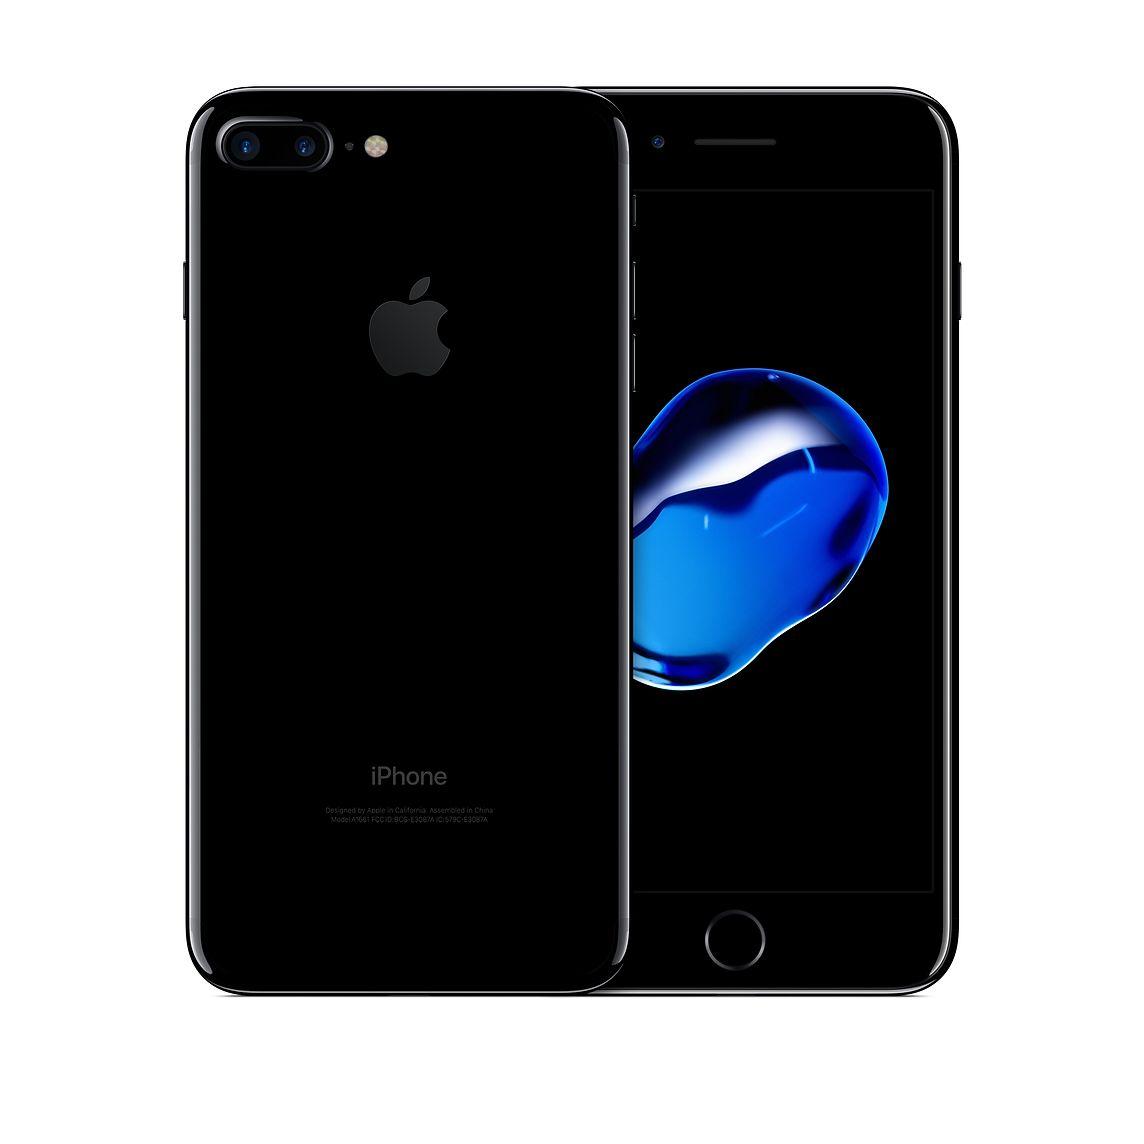 نقد-بررسی-اپل-آیفون-سون-پلاس-Apple-iPhone-7-Plus...jpg